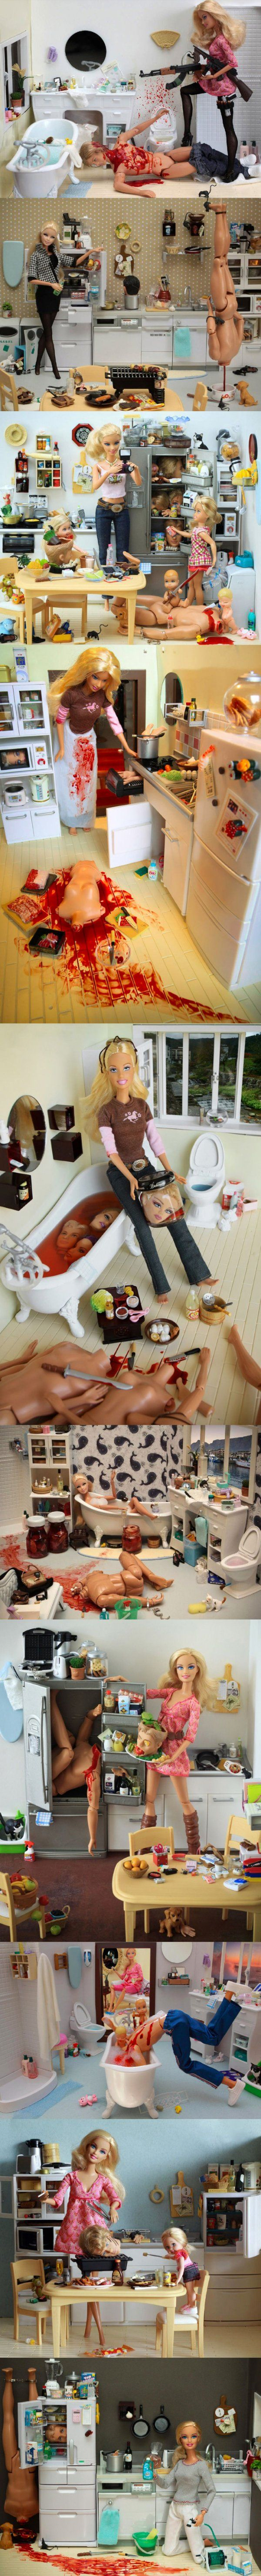 Serial killer barbie | Webfail - Fail Pictures and Fail Videos